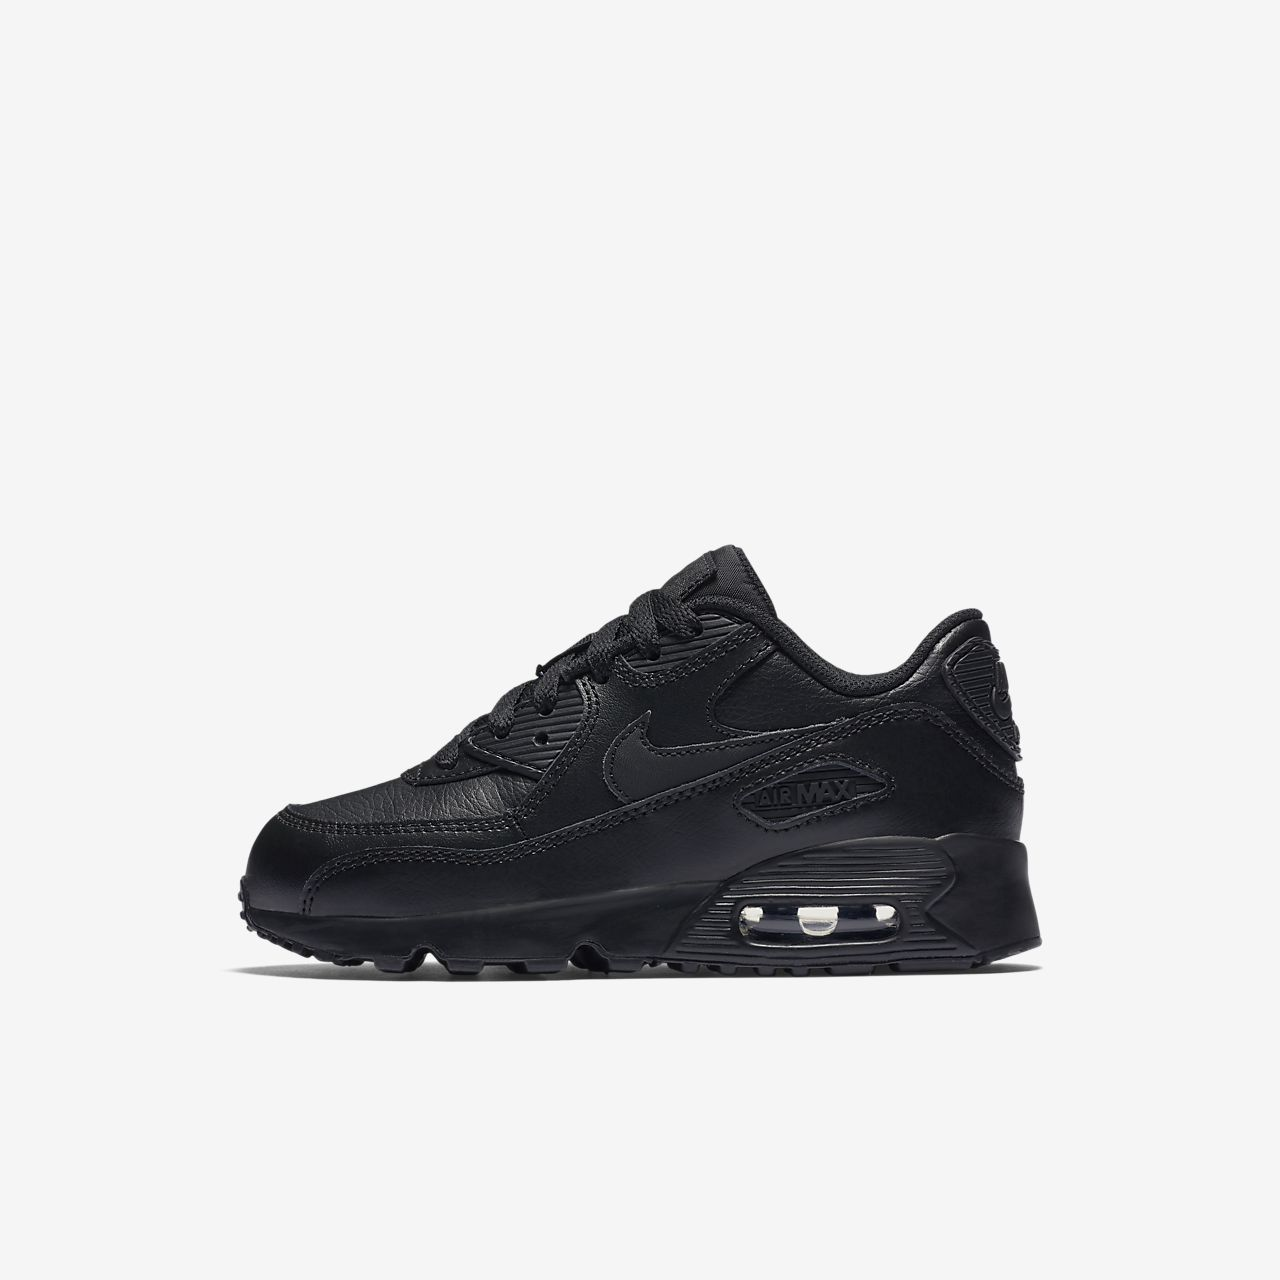 new styles e0b9e f51fe Nike Air Max 90 Leather Schuh für jüngere Kinder